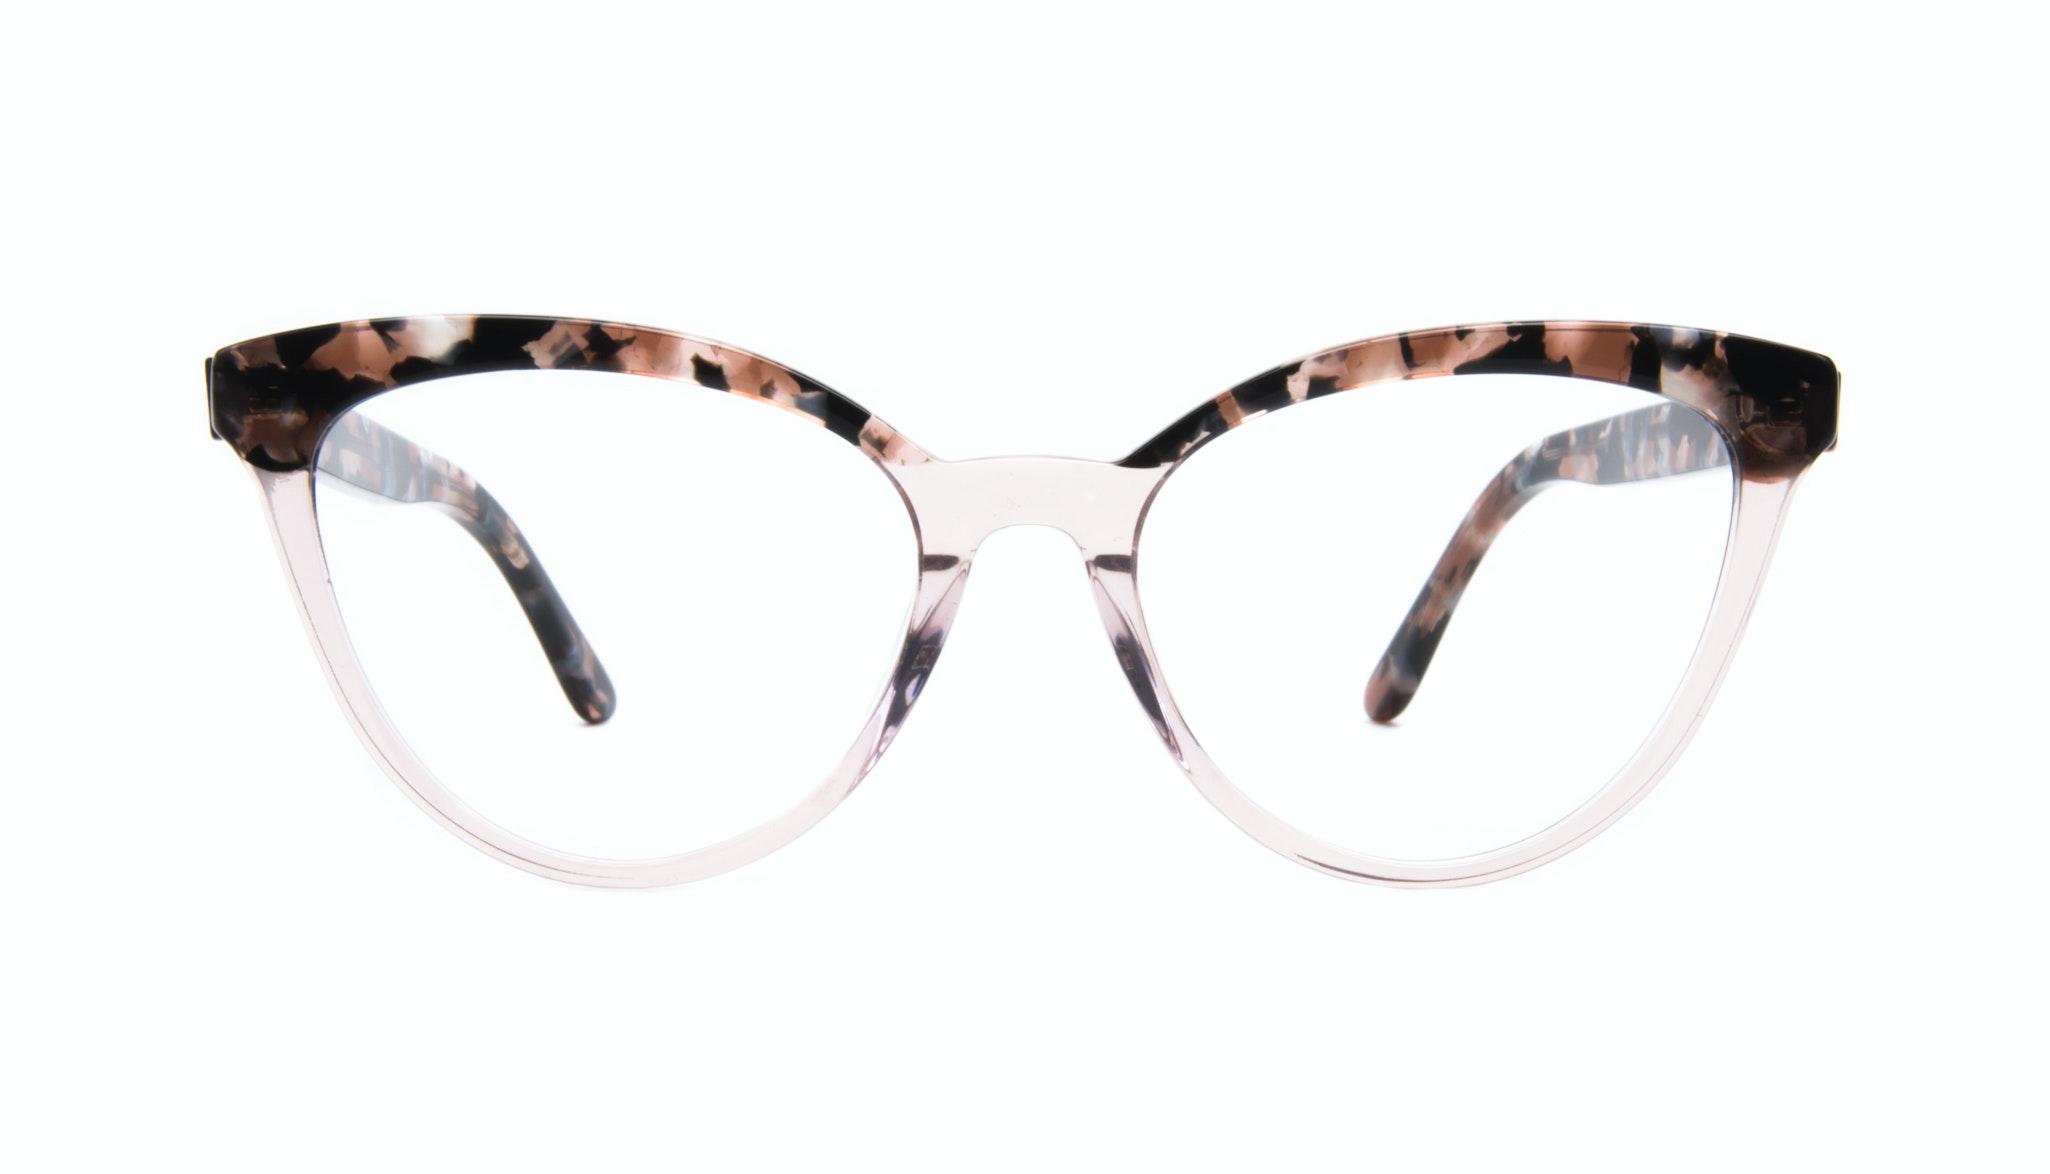 Affordable Fashion Glasses Cat Eye Daring Cateye Eyeglasses Women Reverie Rose Tort Front